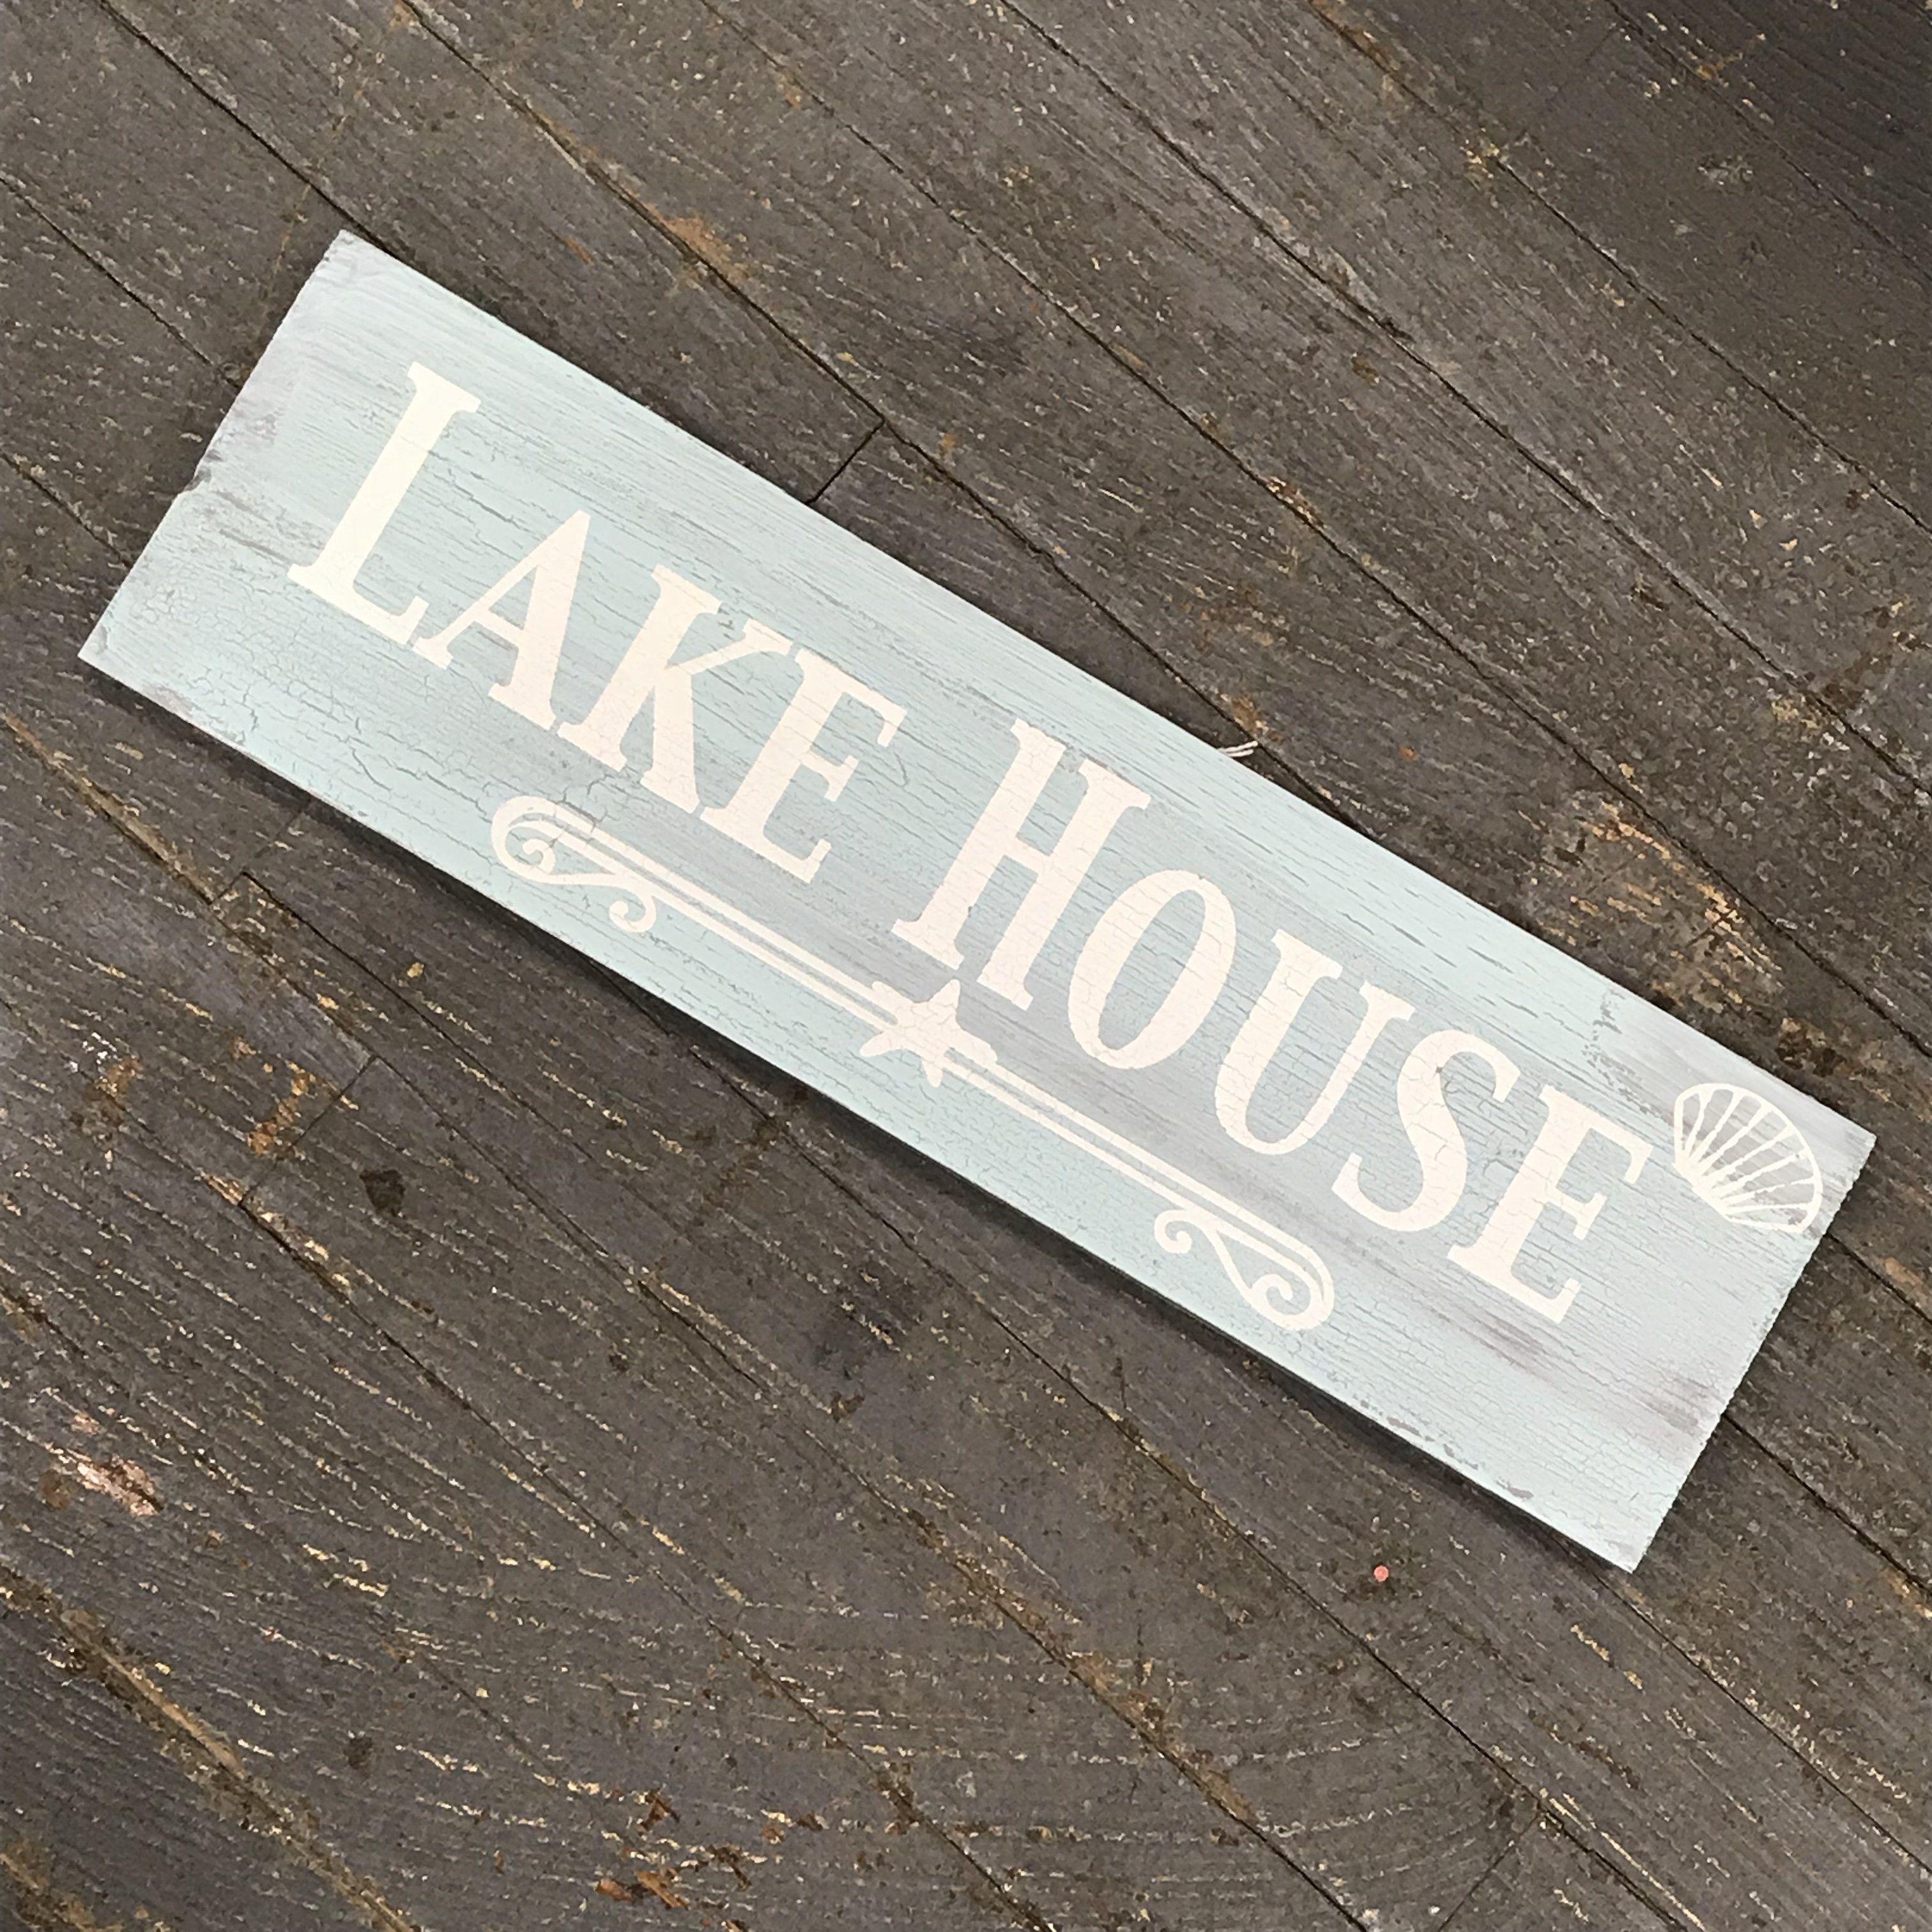 Wood Pallet Lake House Shell Sign Wall Hanger Door Decor